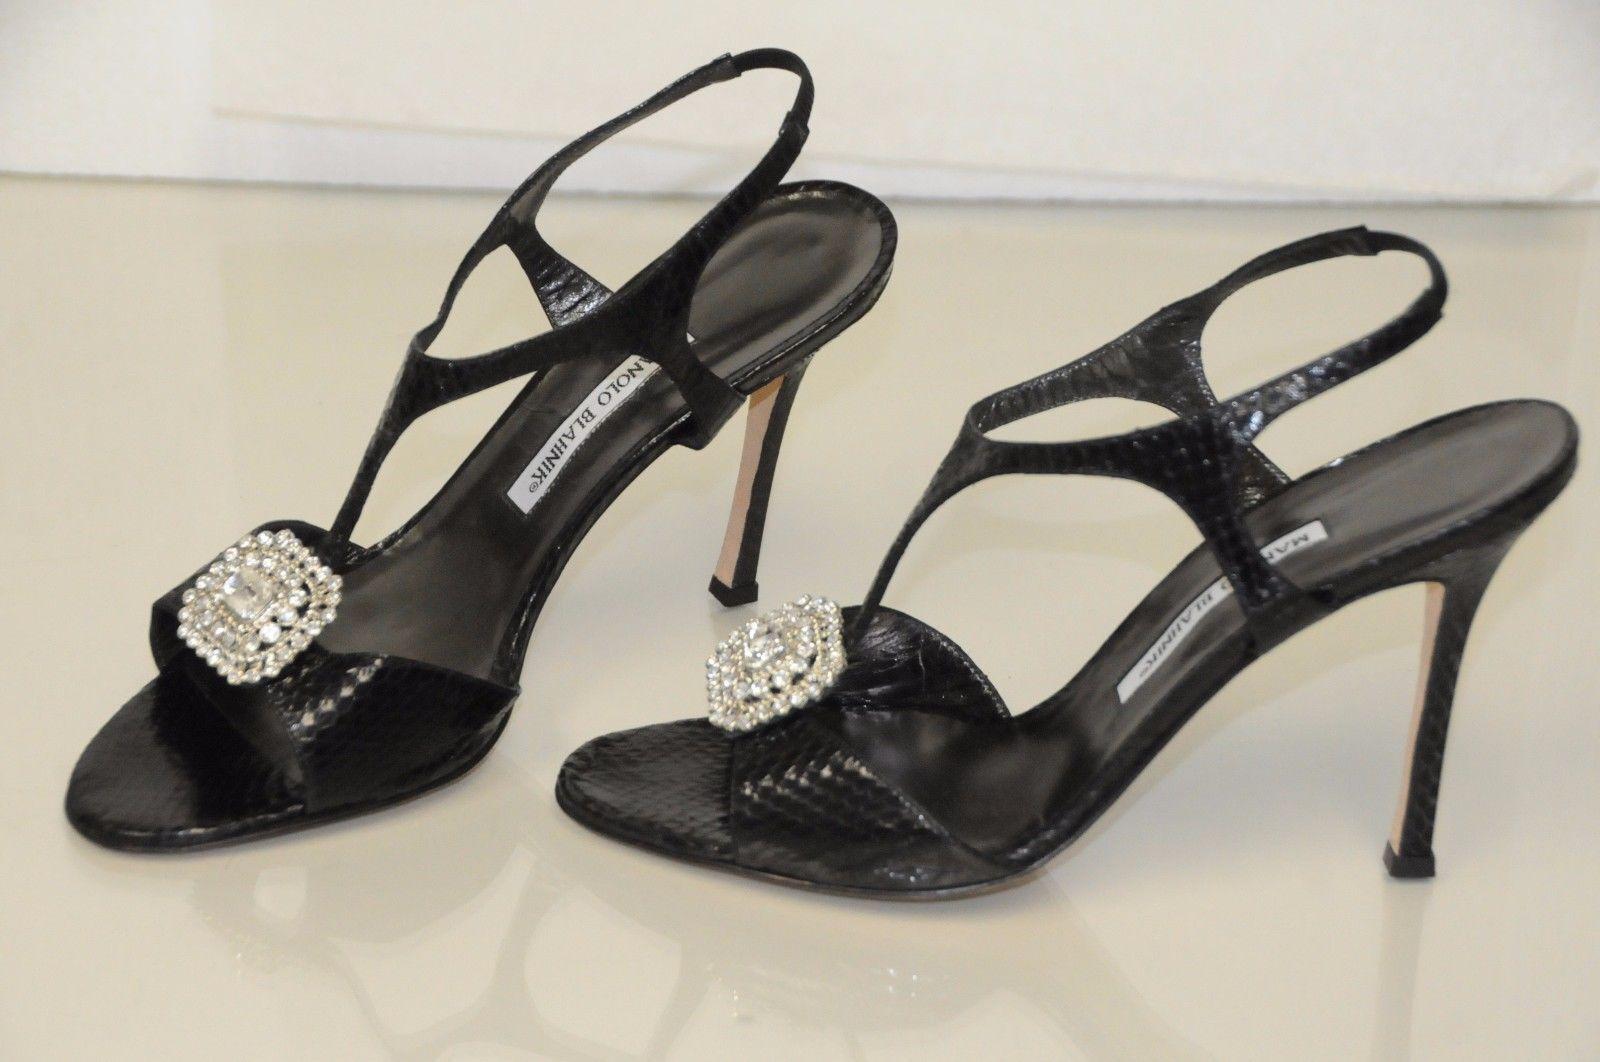 Neu Manolo Blahnik Krusostrel mit Jeweled Kristallen Schuhe Sandalen 41.5